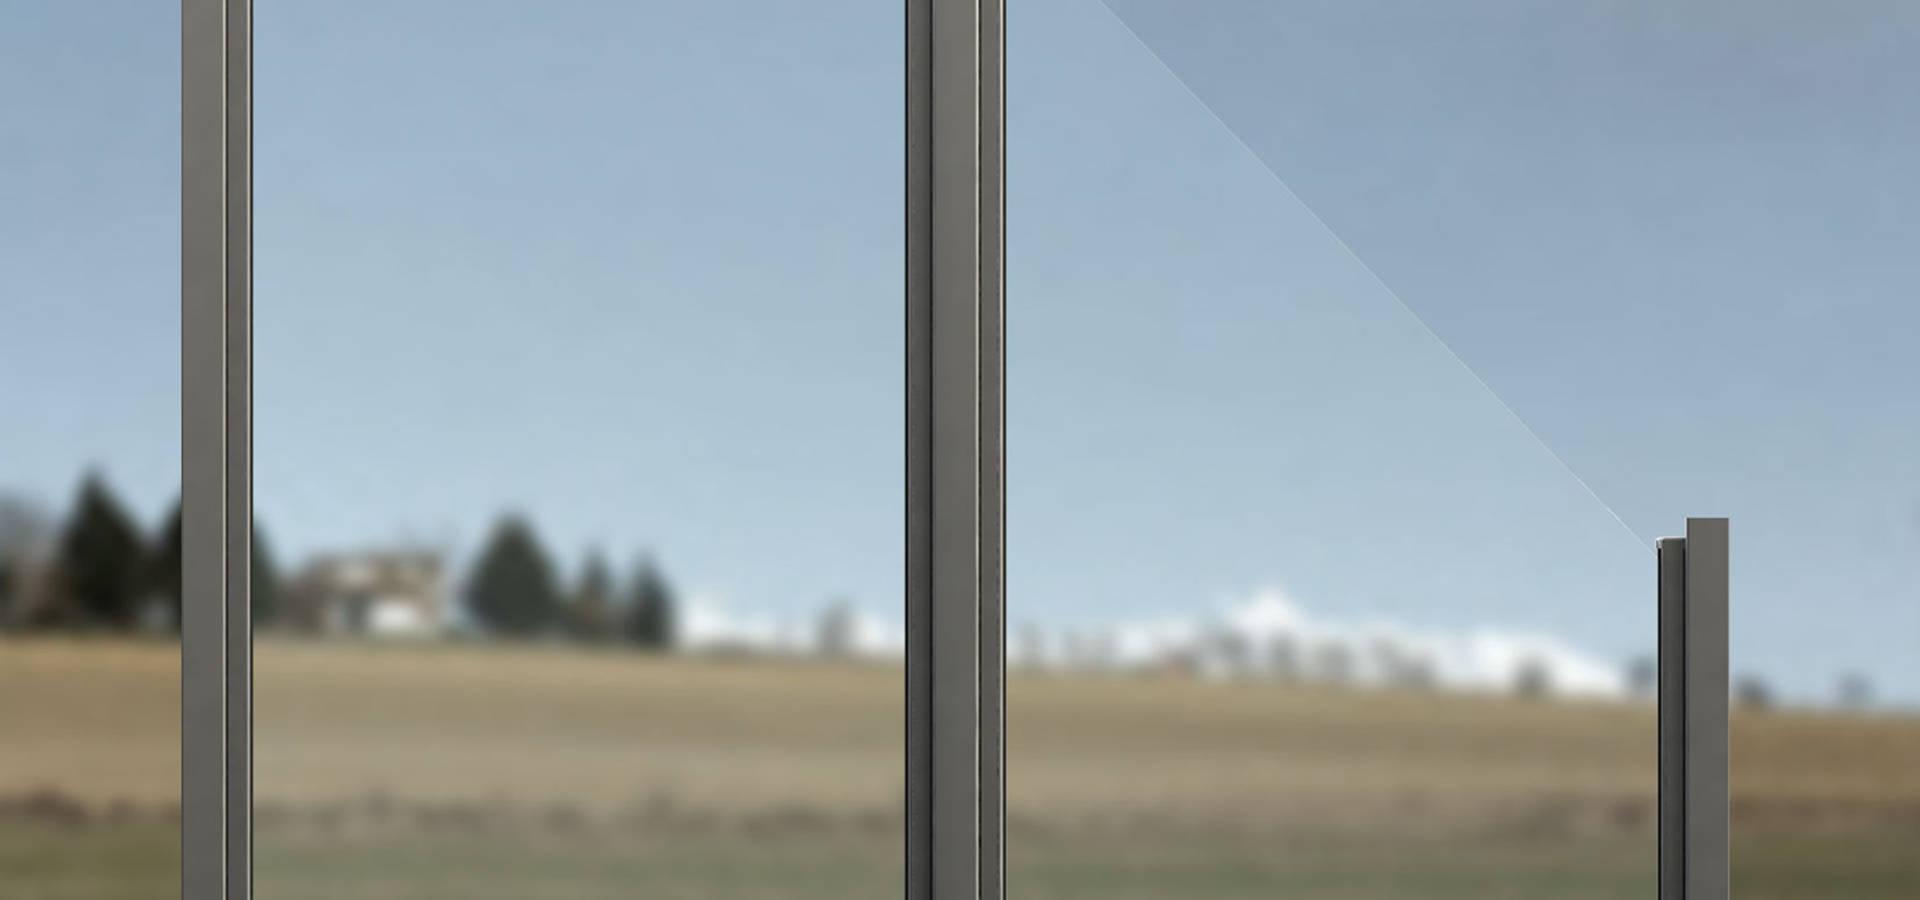 Zaun Aus Glas Realisierte Projekte Kundenfotos من تنفيذ Zaun